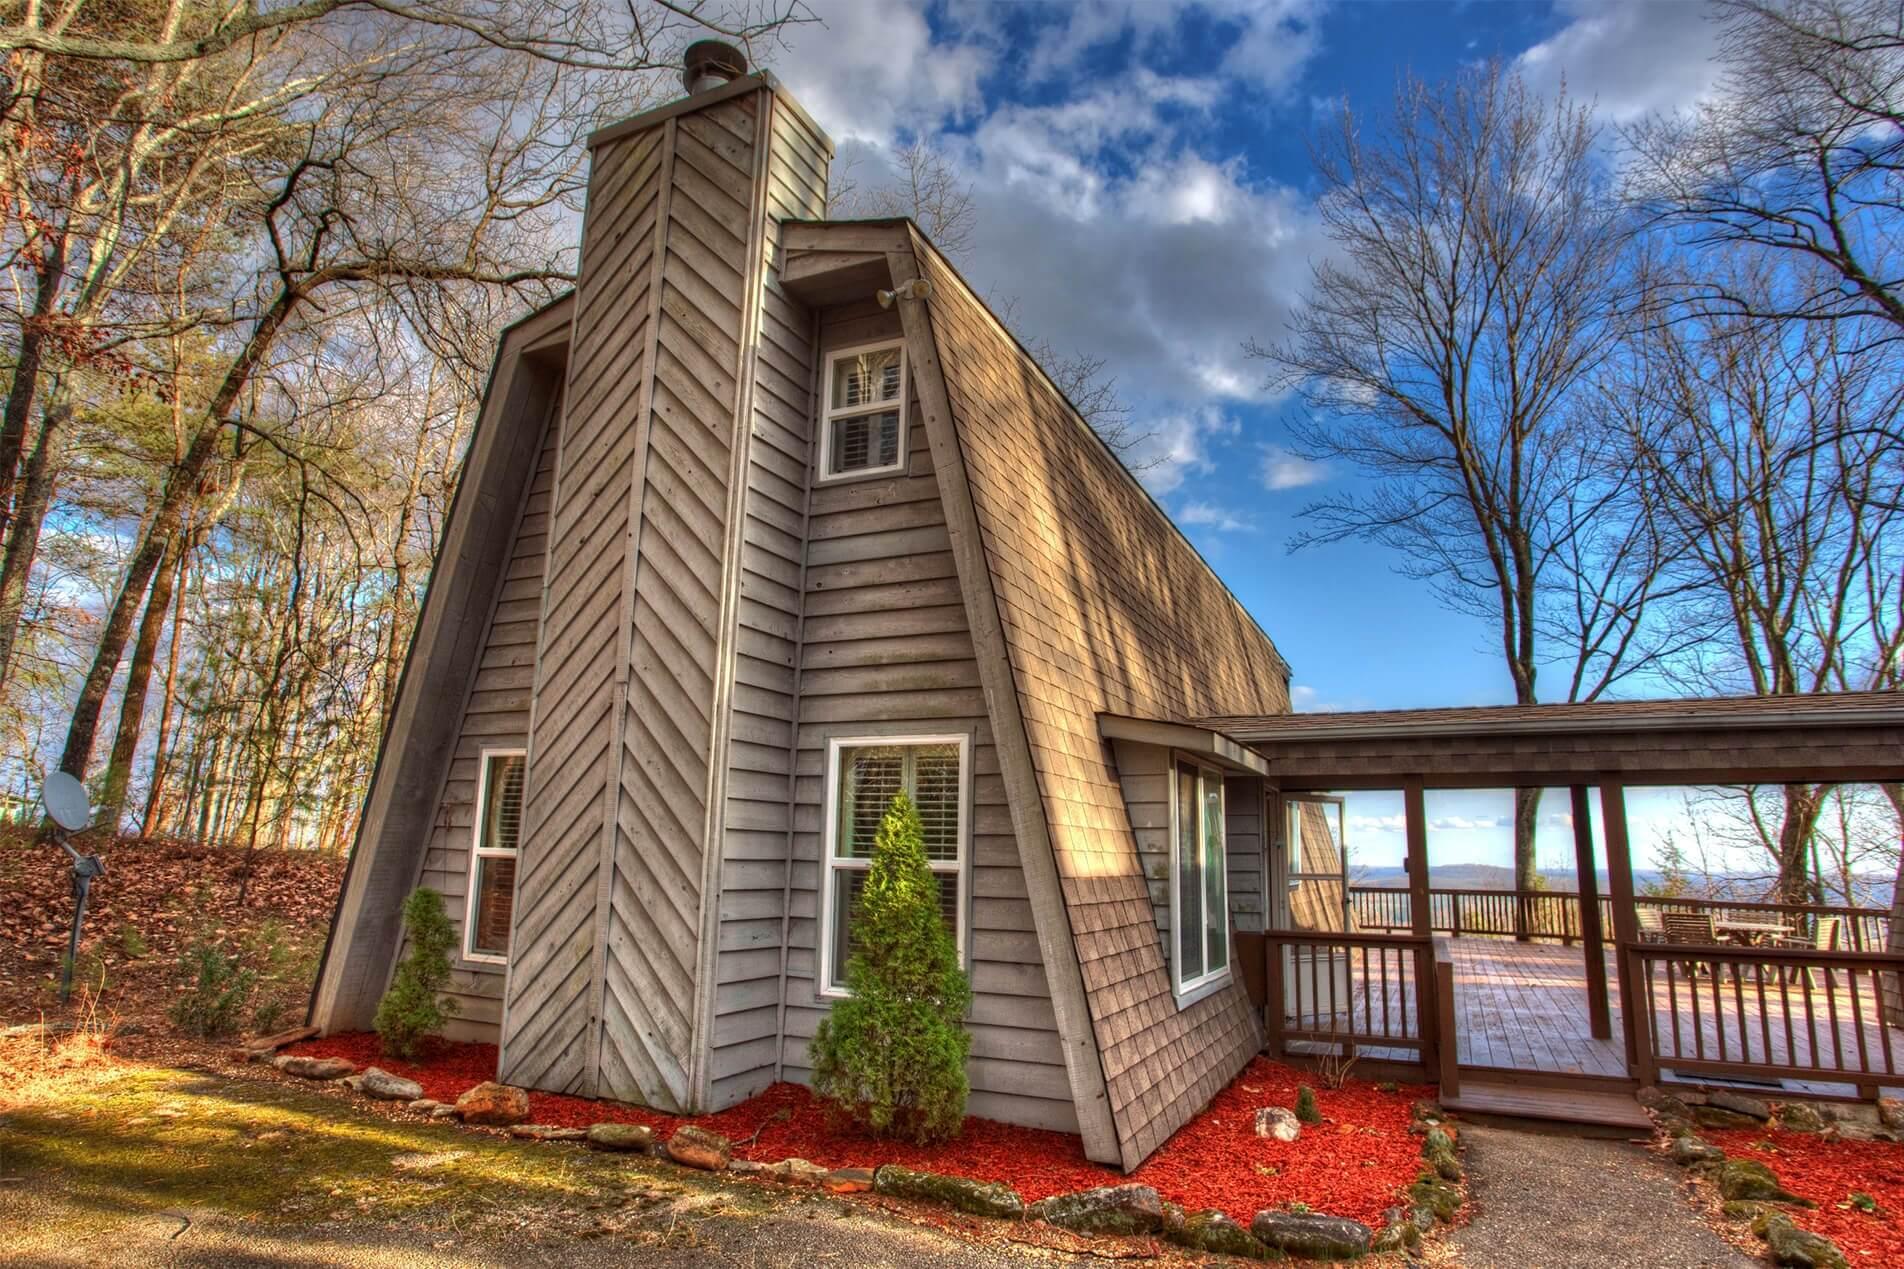 Sweet-Retreat-Cedar-Creek-Cabin-Rentals-Helen-Georgia-top-banner-tiny